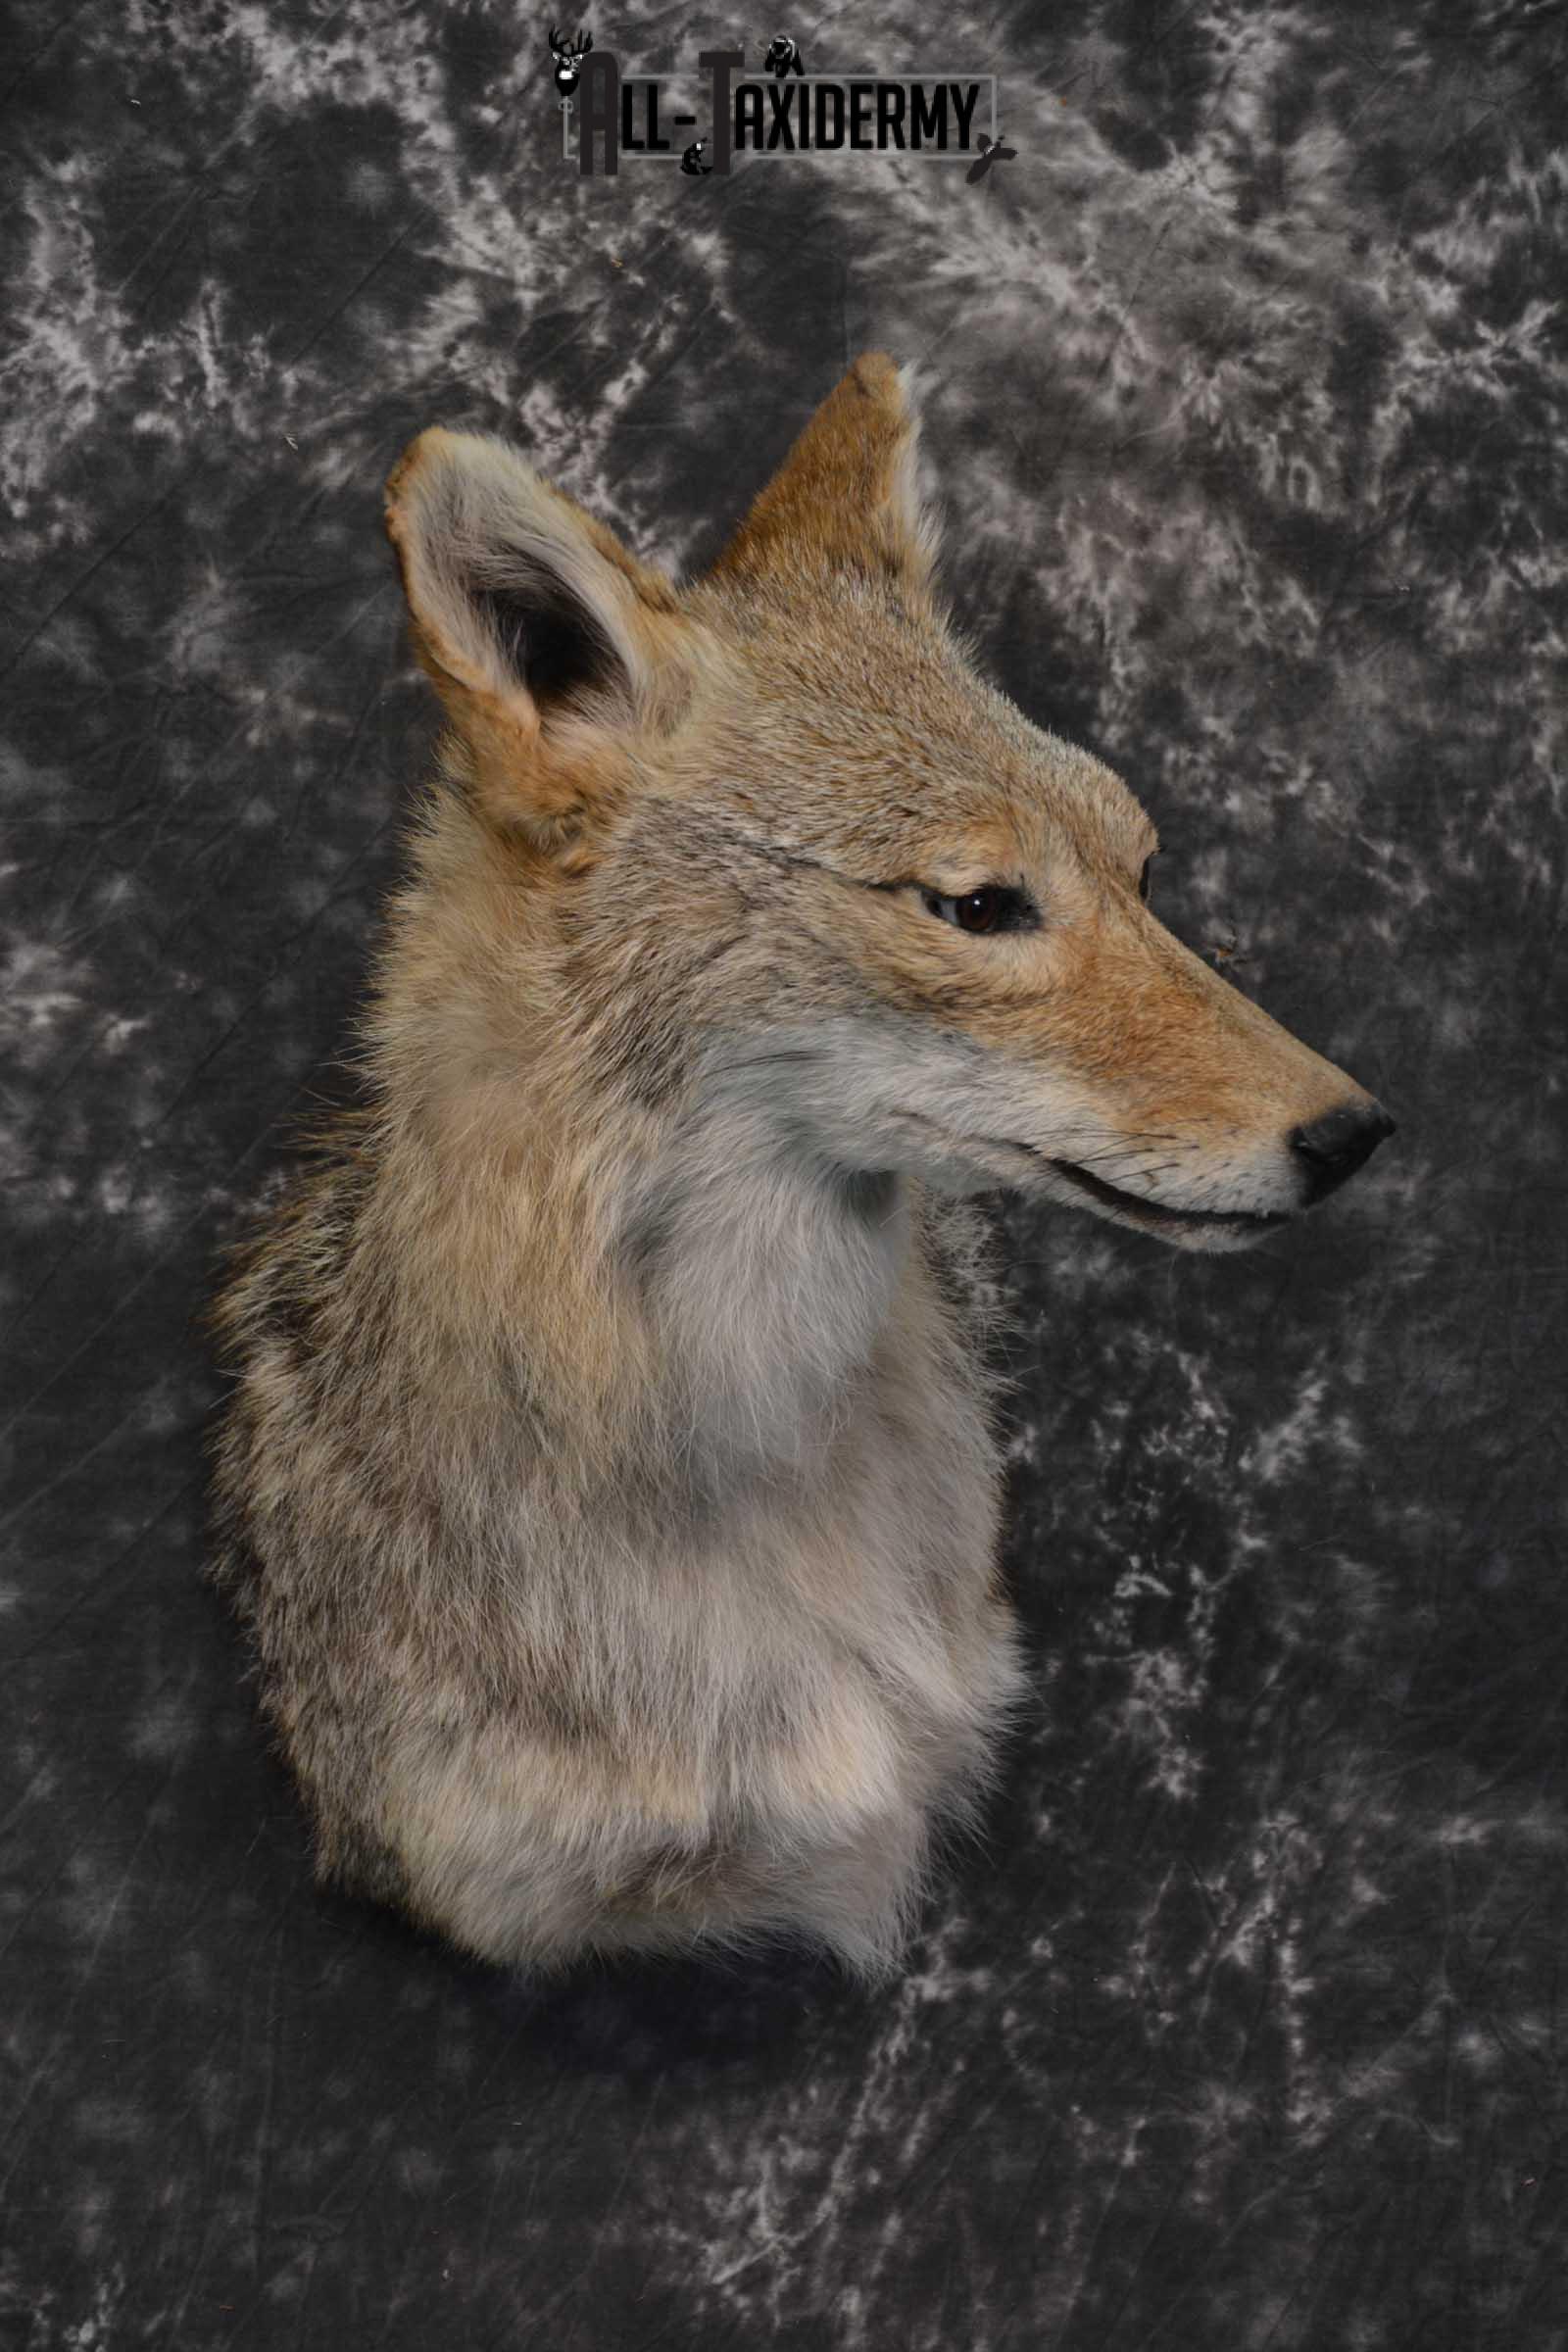 Coyote Taxidermy Shoulder Mount for sale SKU 1811